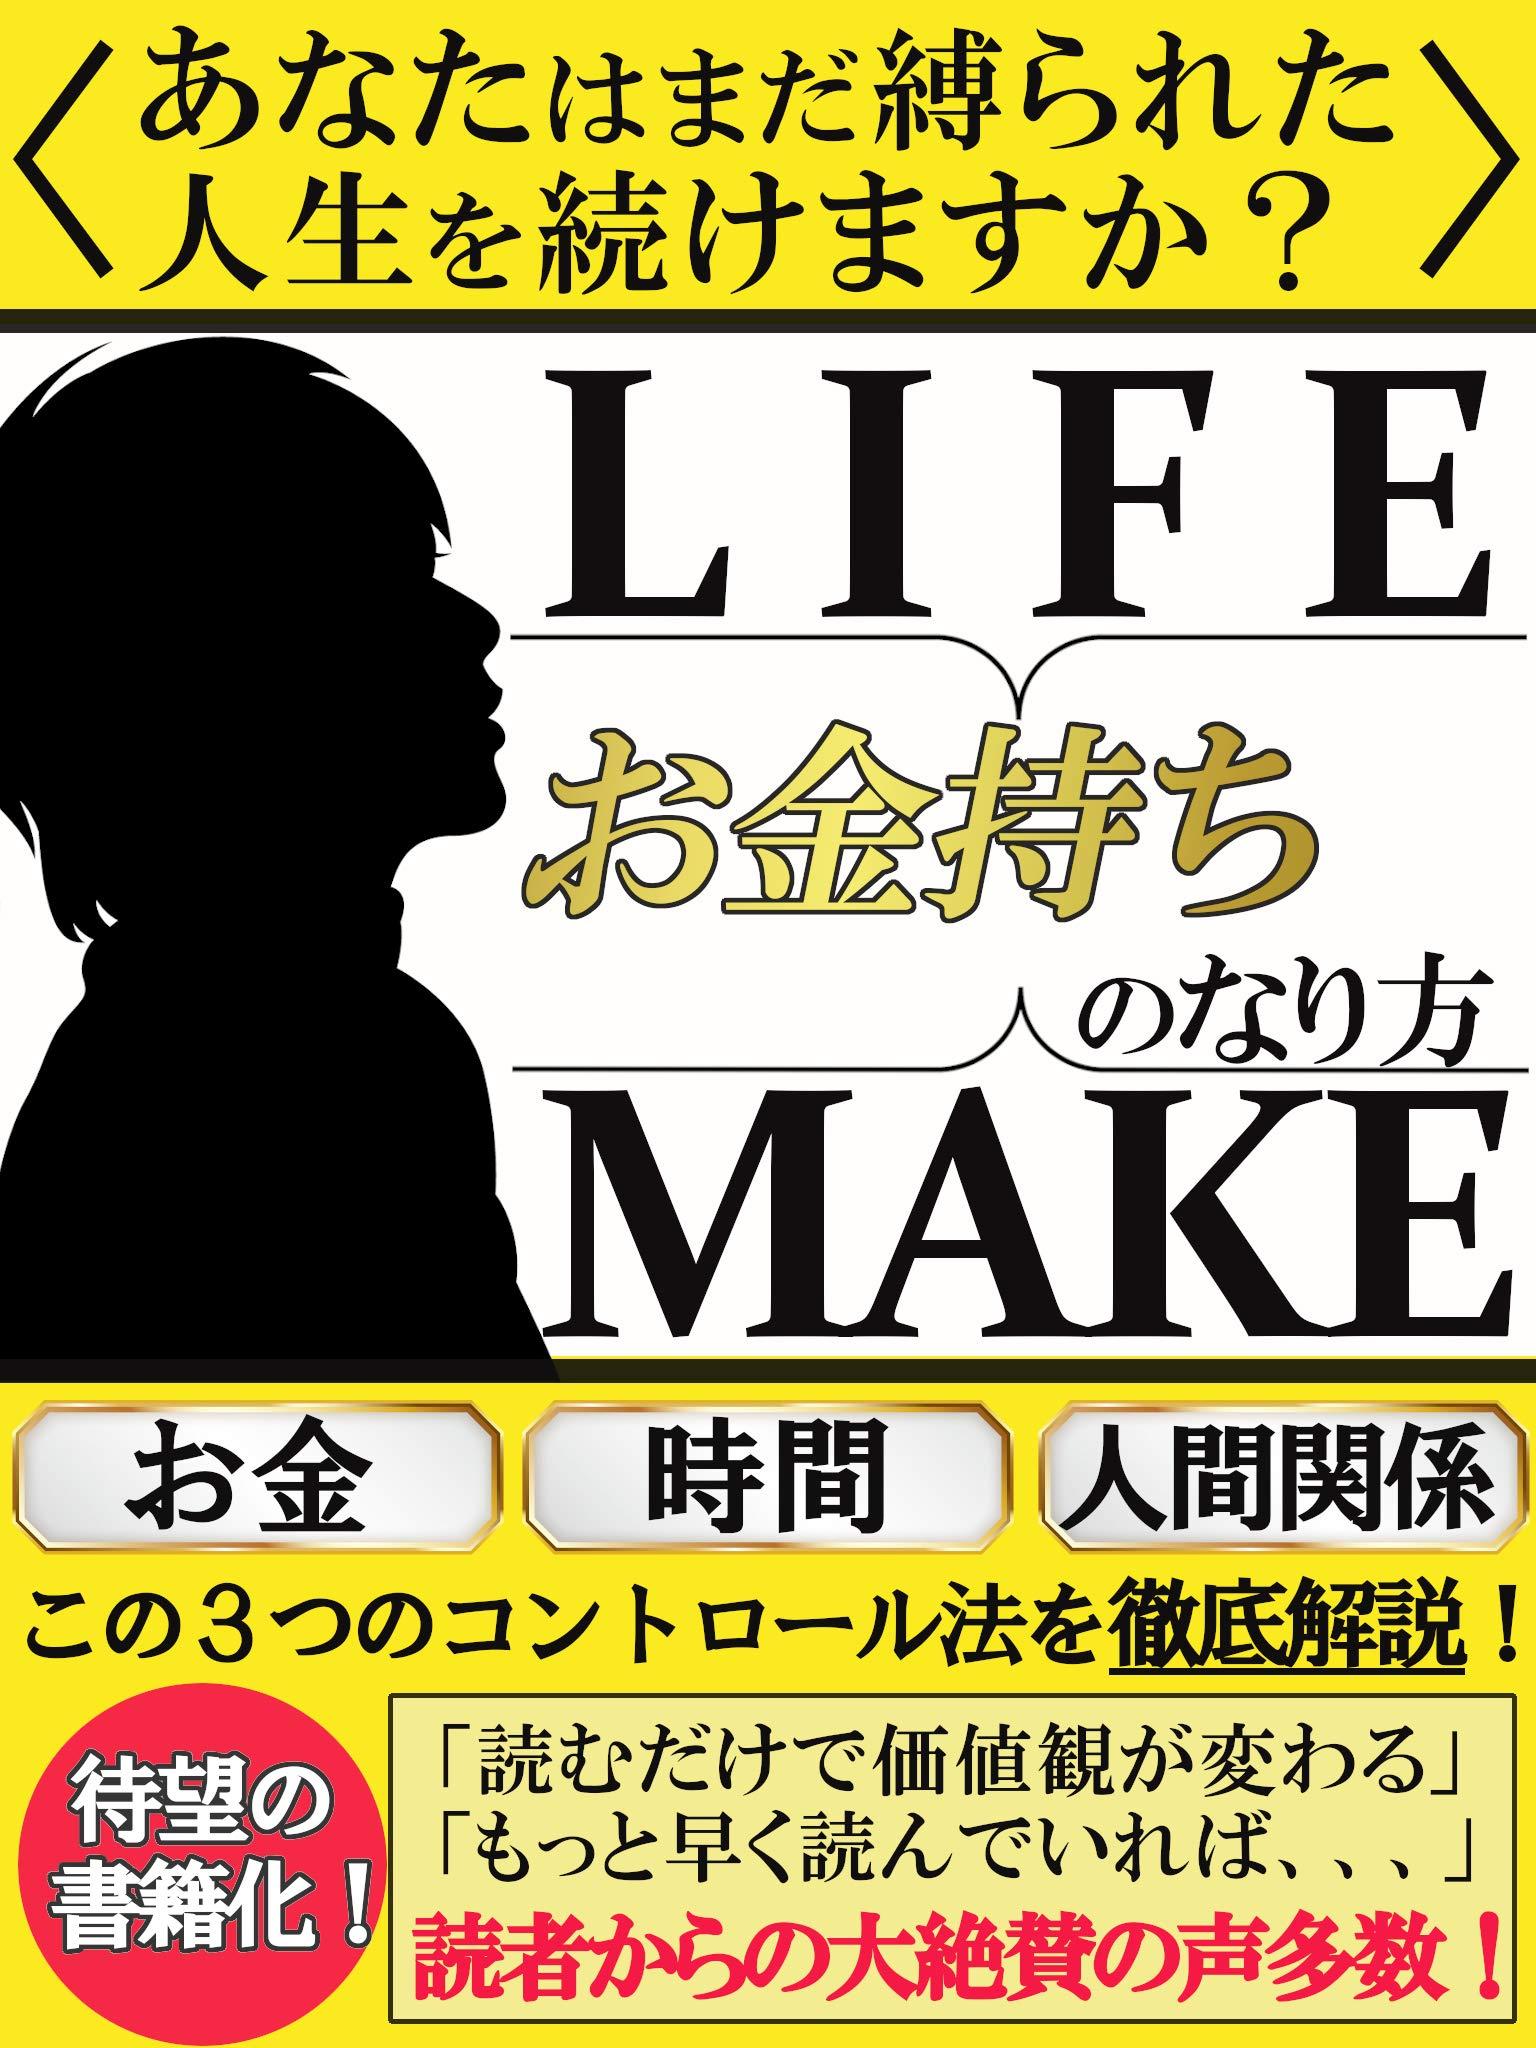 okanemotinonarikata: okanejikanningenkankeiwokontoro-rudekiru (Japanese Edition)